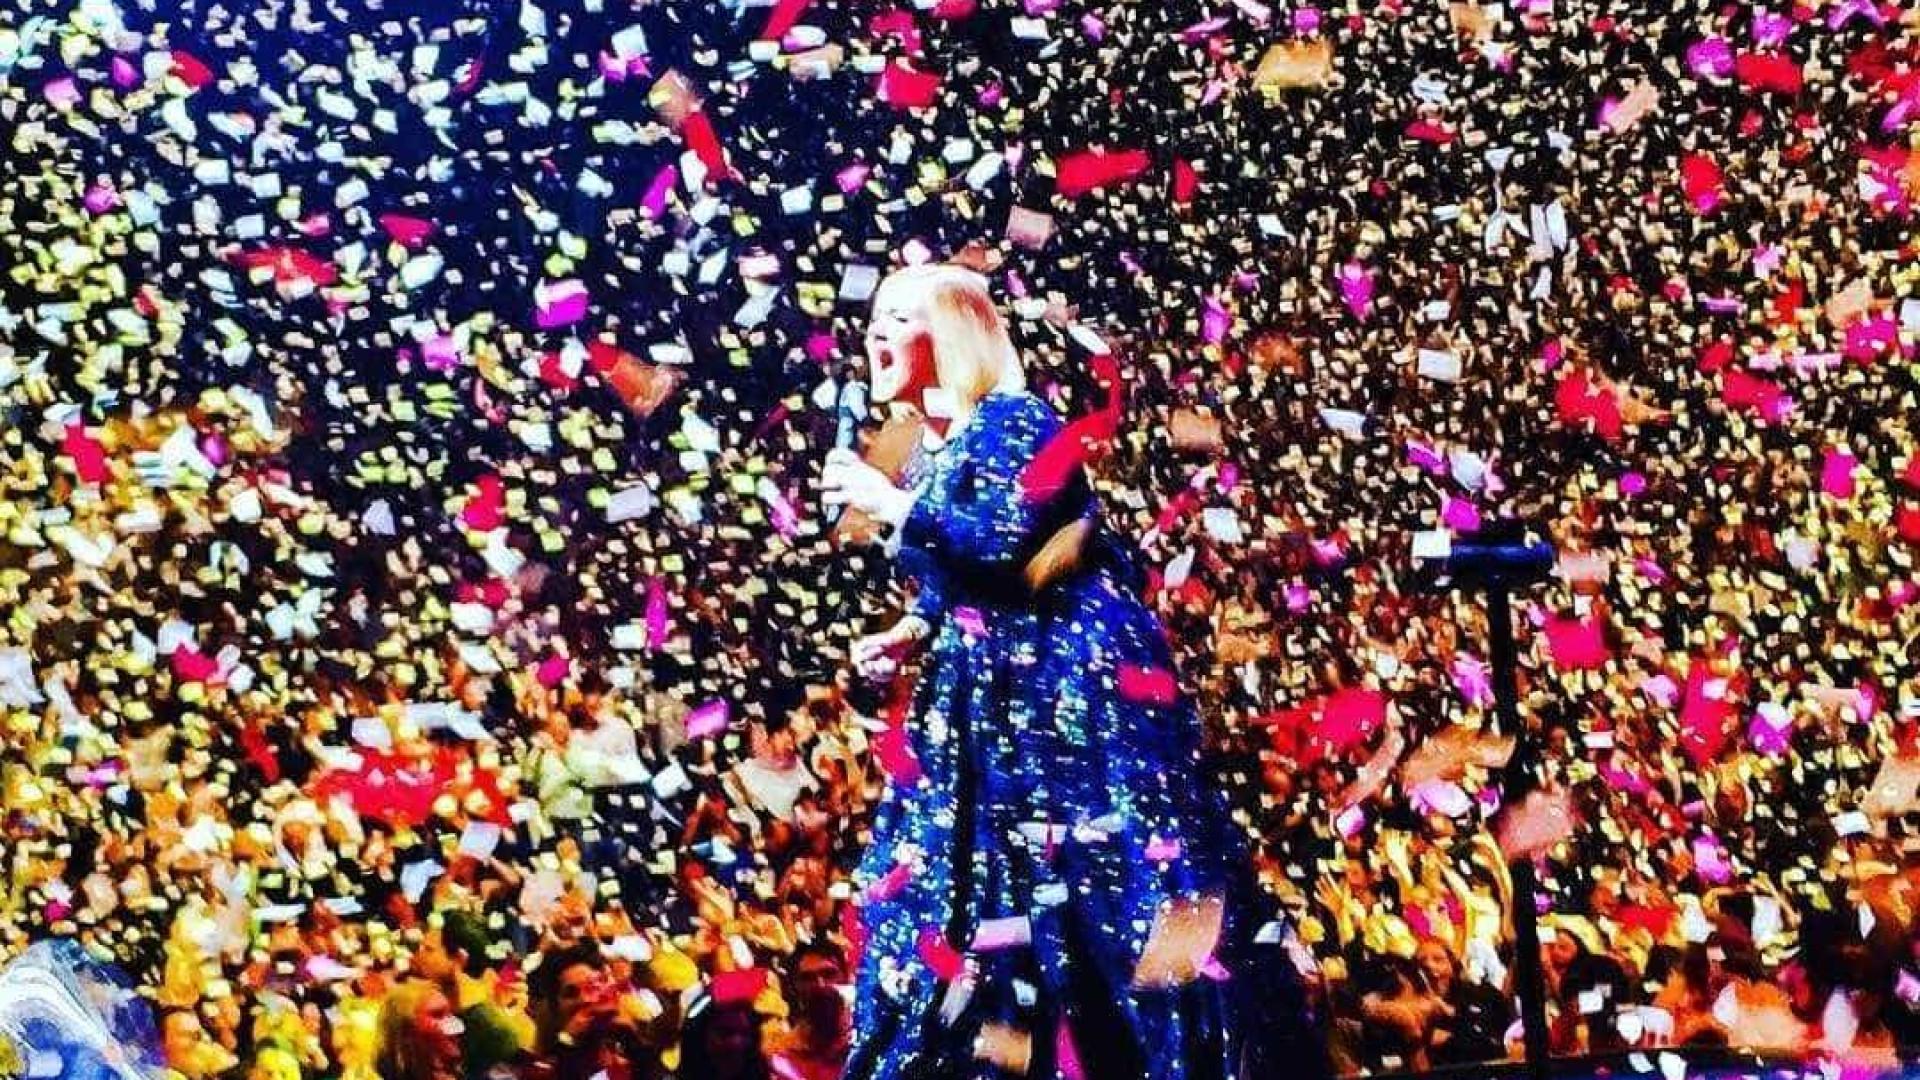 Adele recebe surpresa especial do namorado durante espetáculo